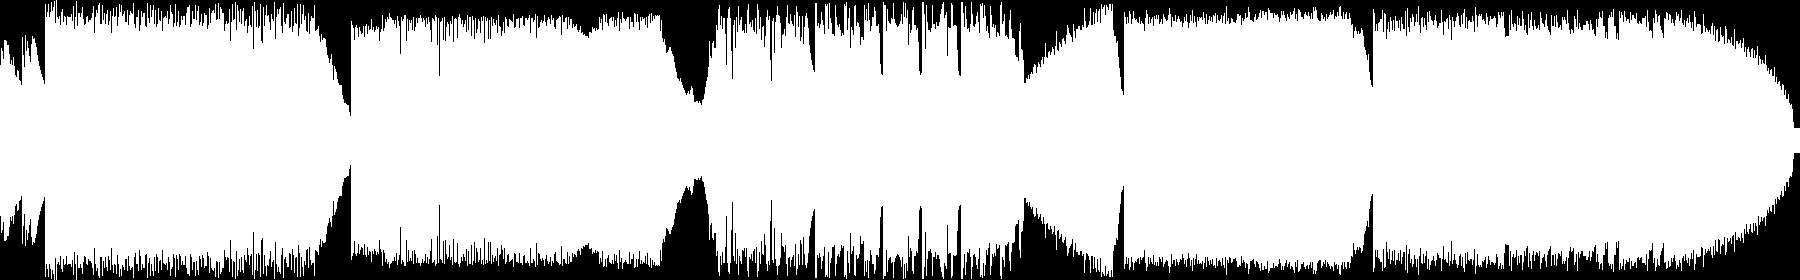 Bassic audio waveform